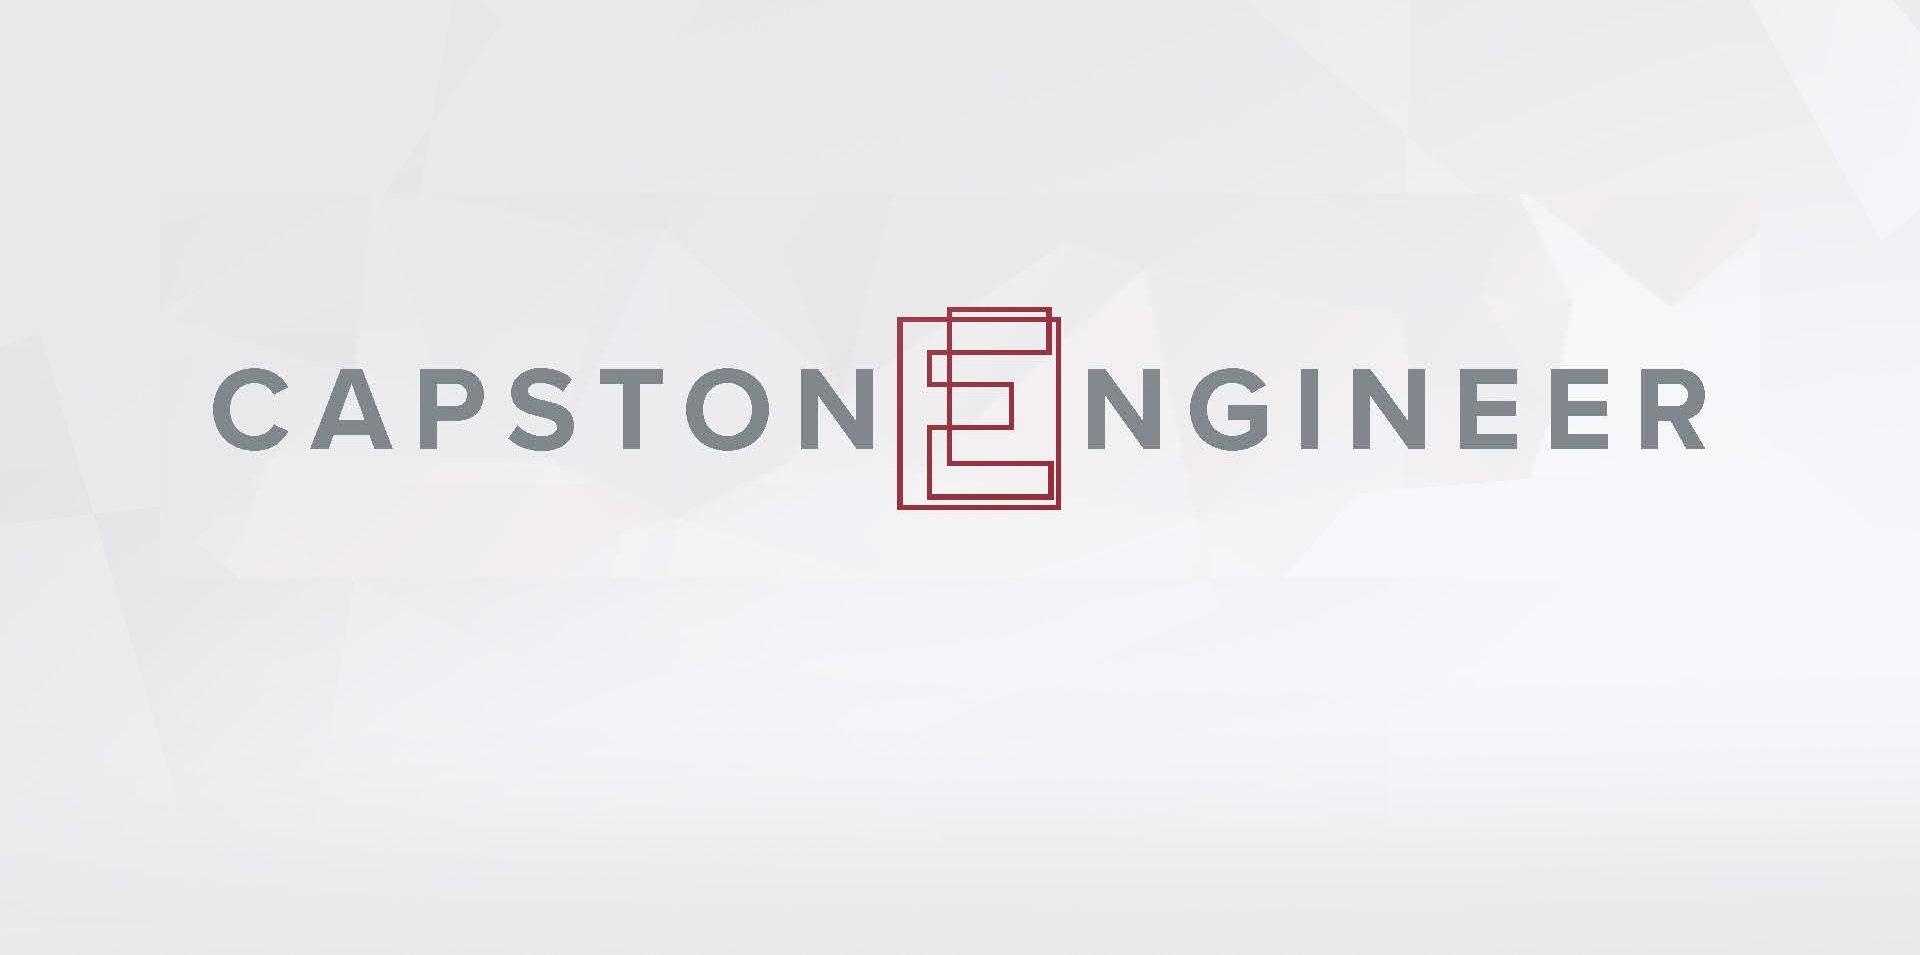 Capstone Engineer logo